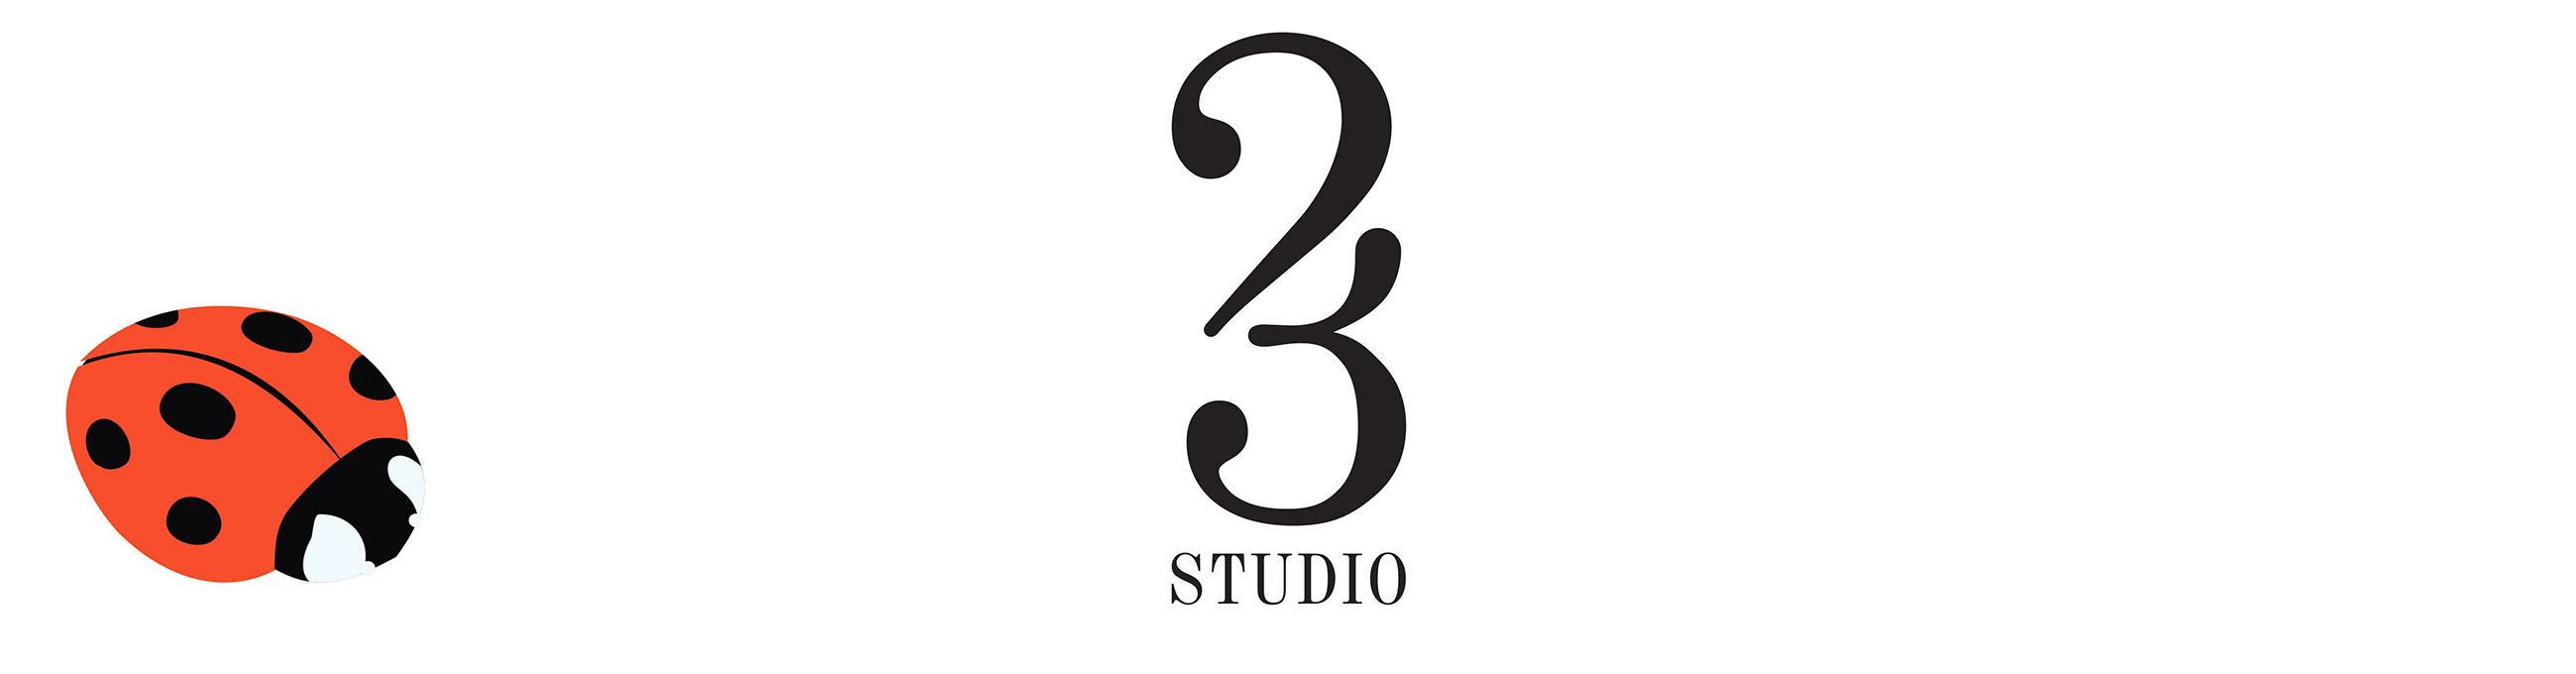 23Studio | Creative agency | Bergamo